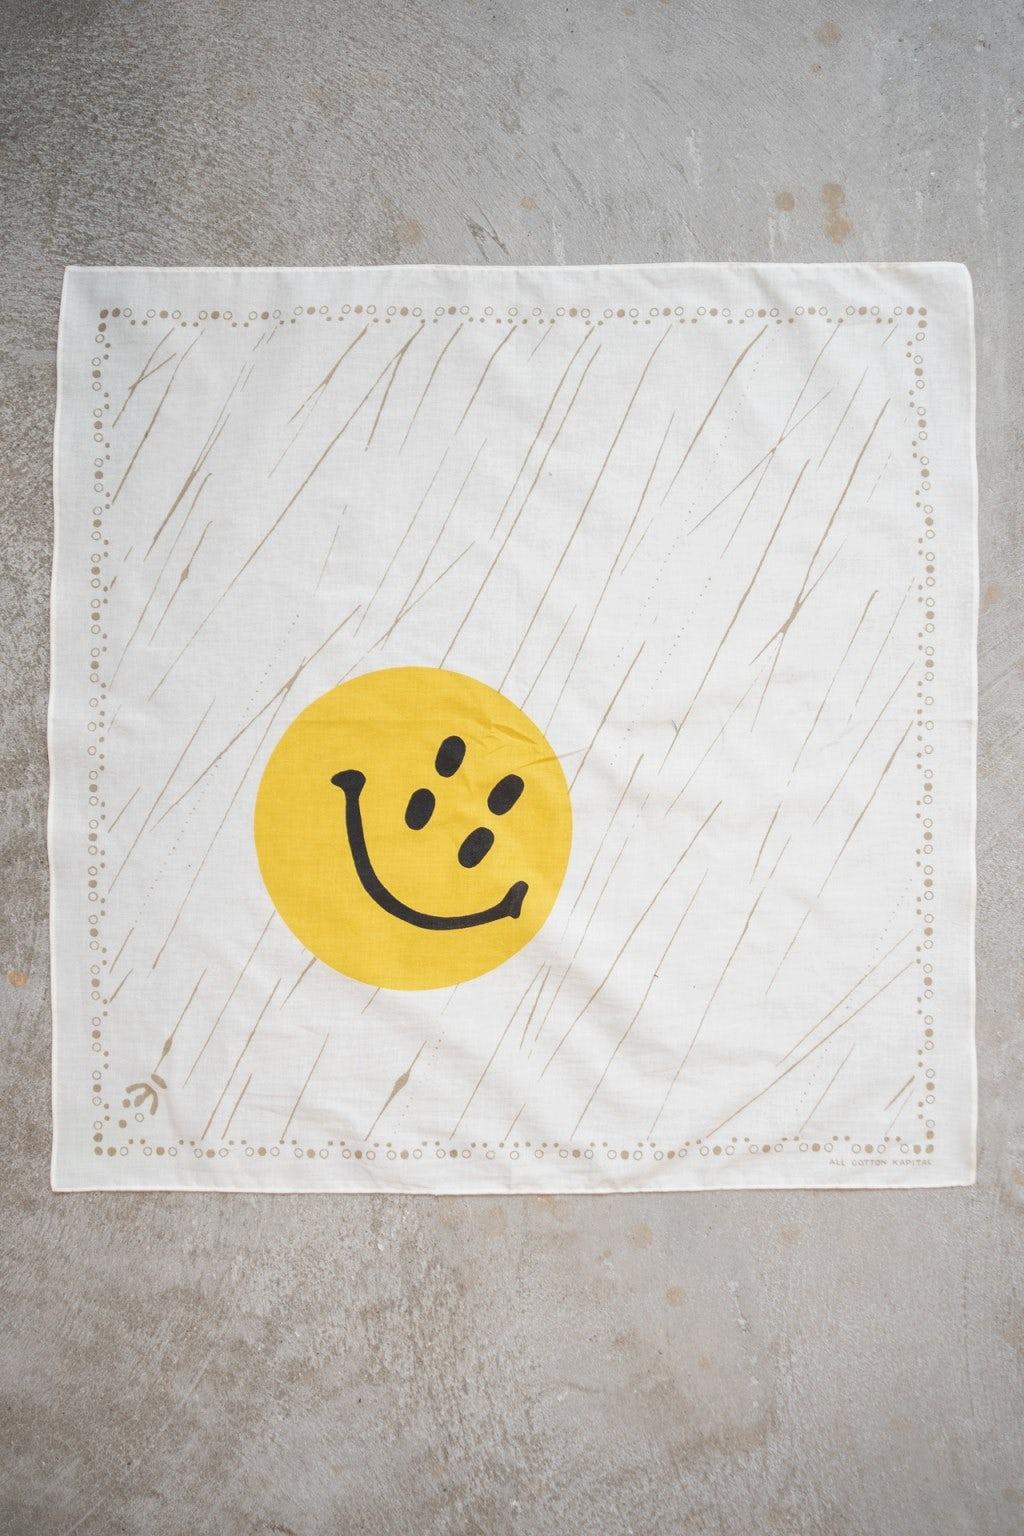 Kapital Fastcolor Selvedge Badana (RAIN SMILE) White